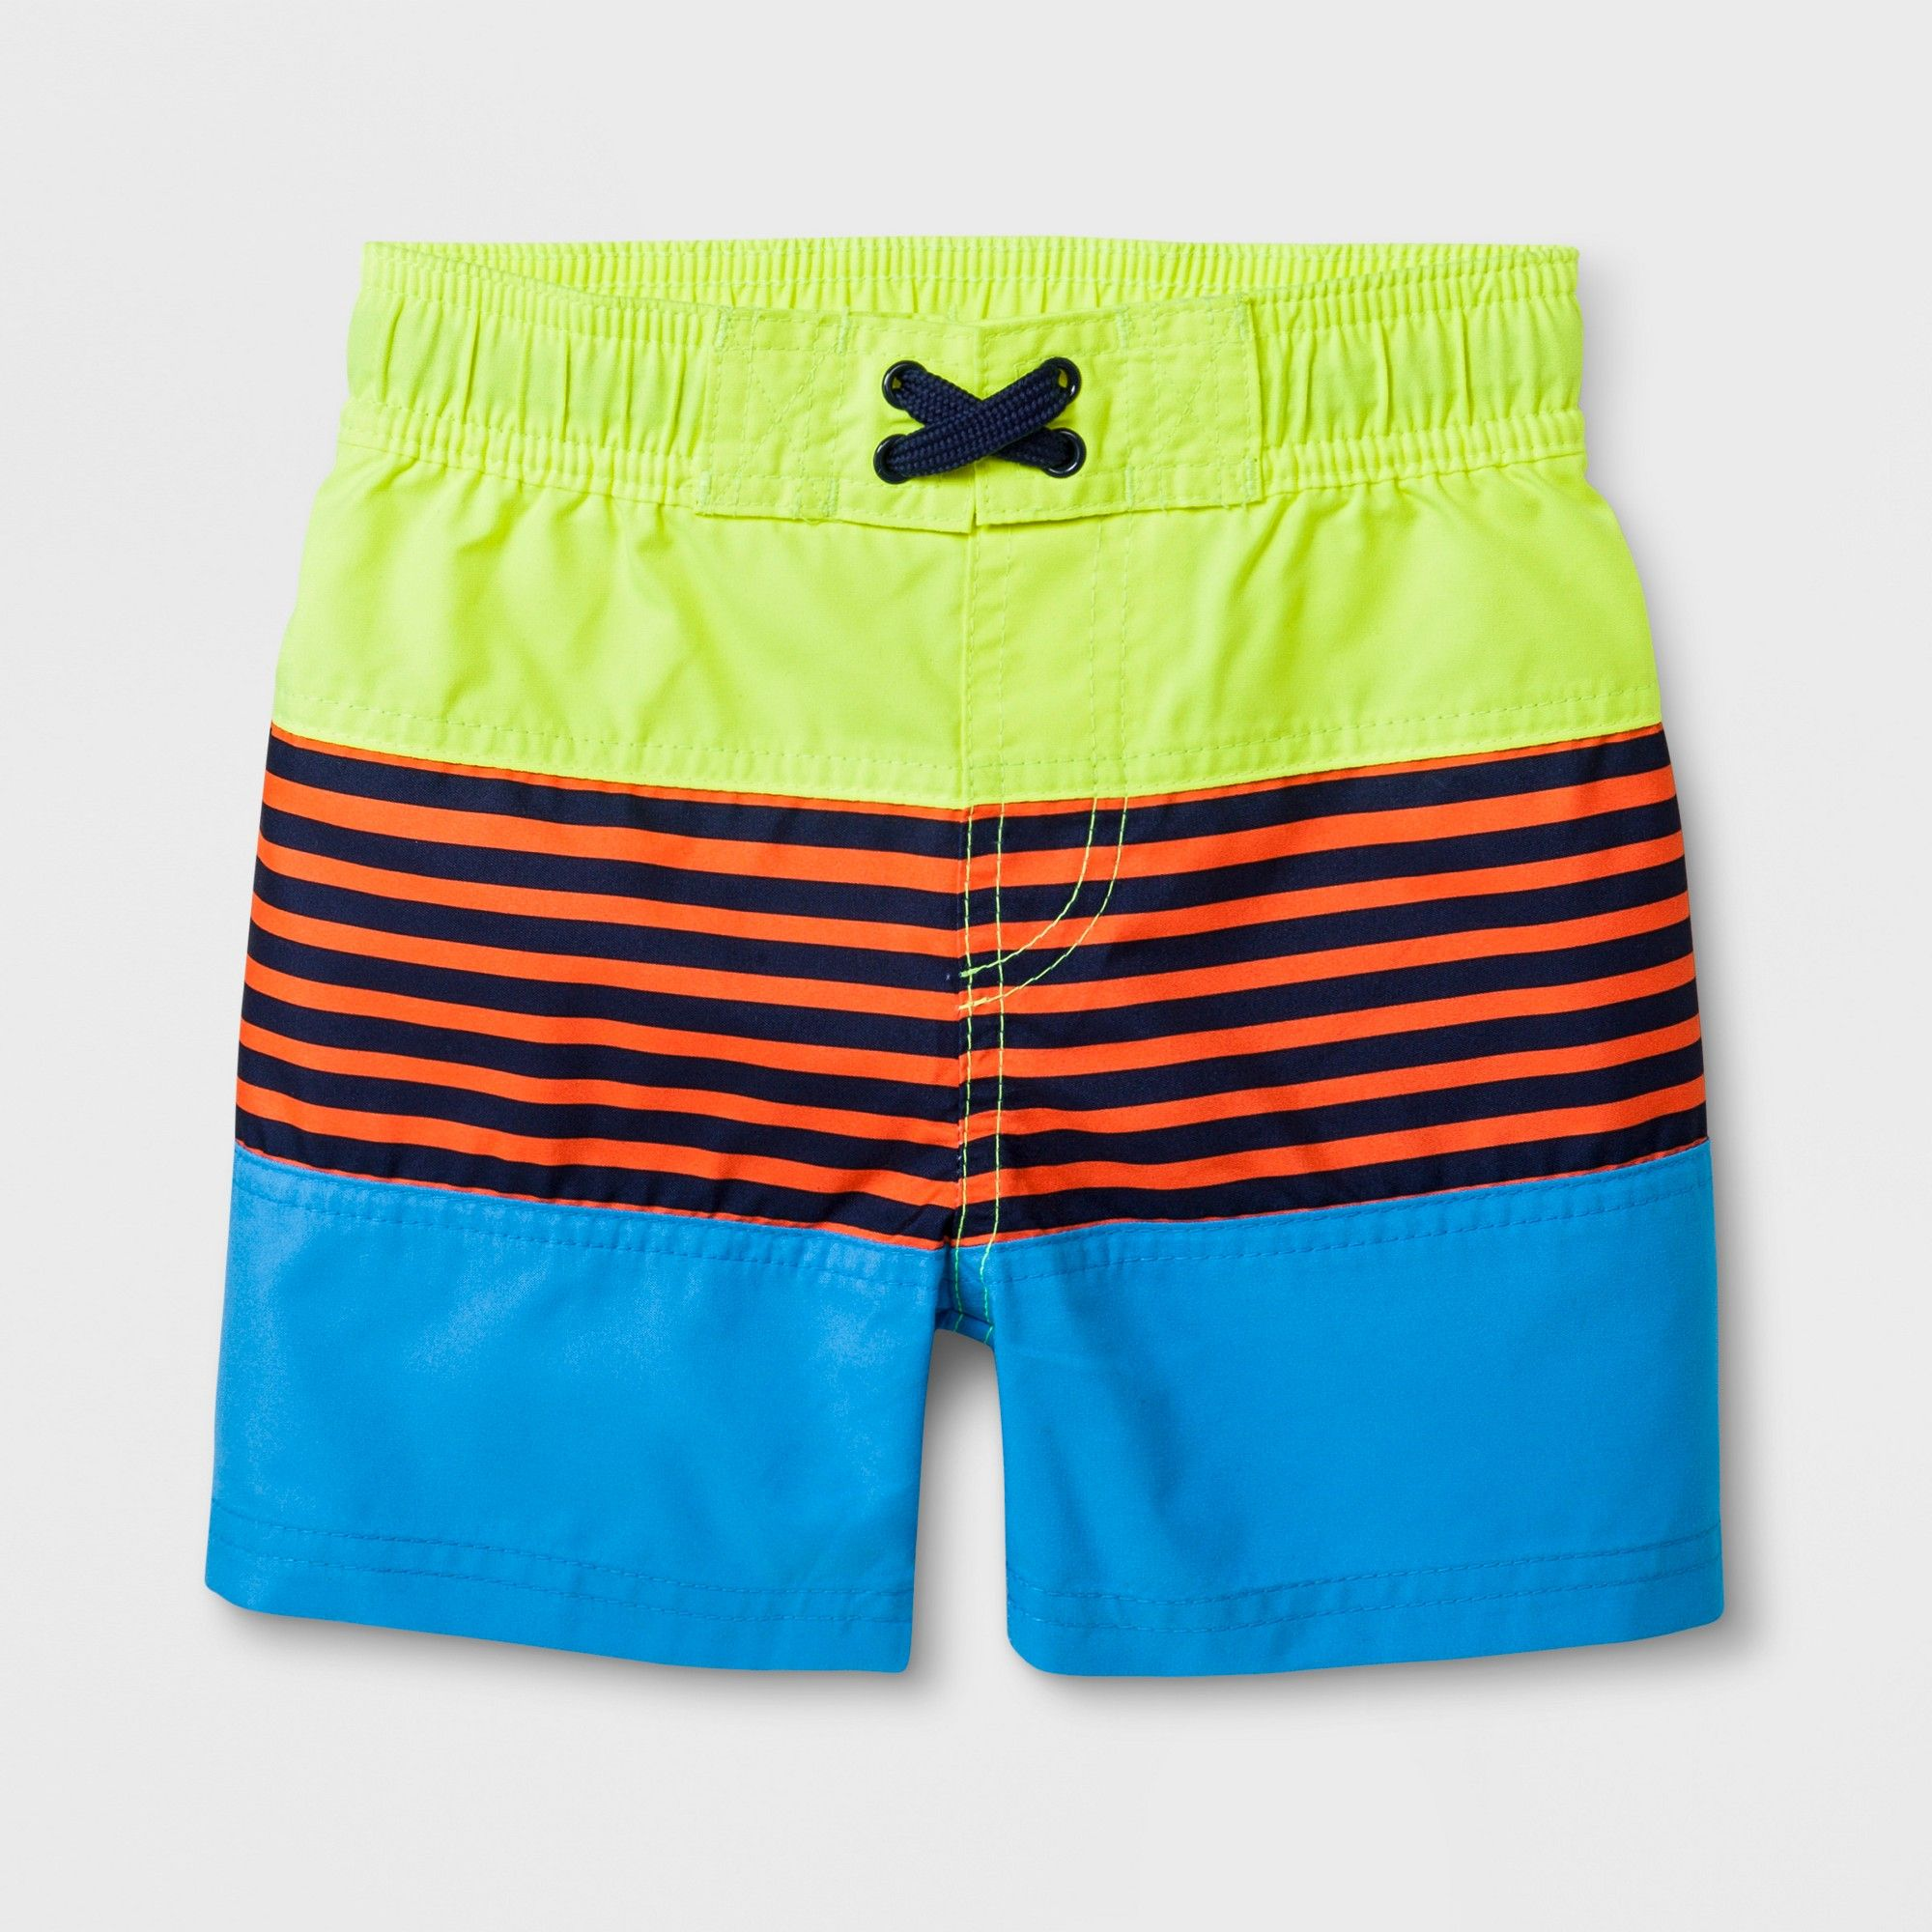 Toddler Boys' Striped Swim Trunks Cat & Jack Yellow 2T